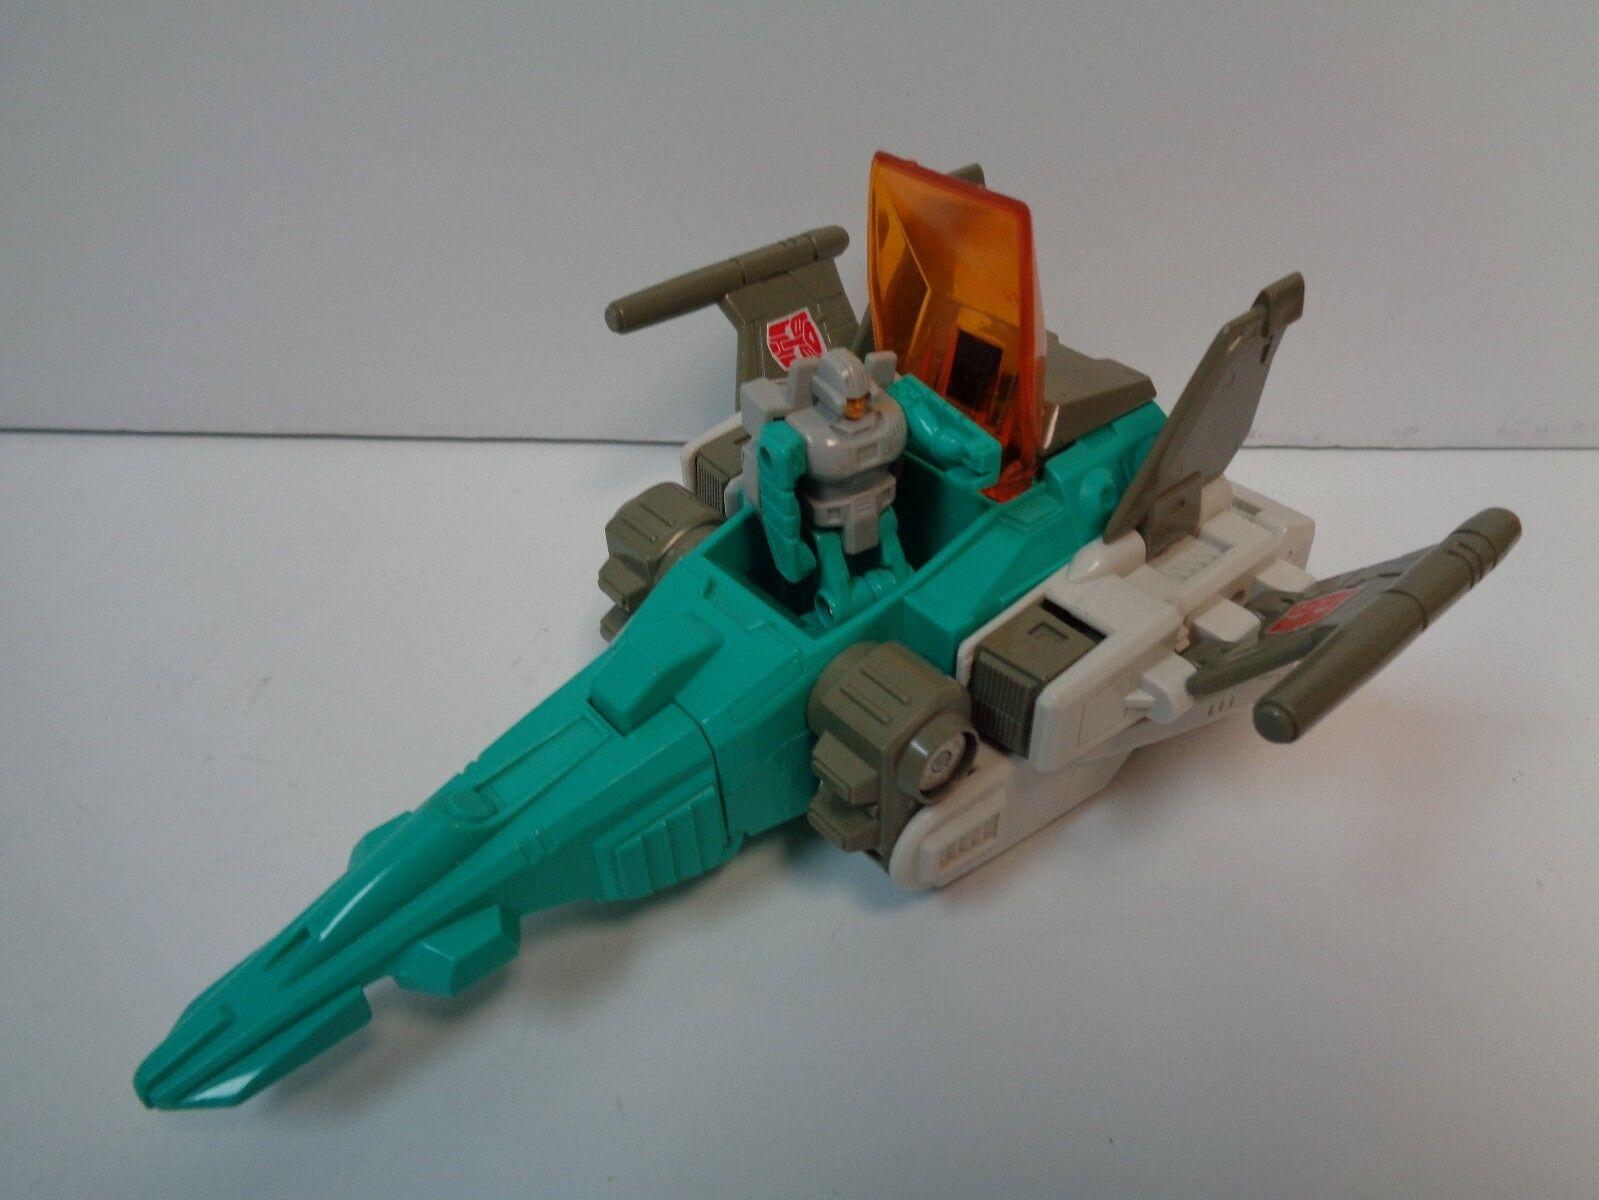 Transformers BRAINSTORM Headmasters G1 - Figure with Cana - 1987 Takara